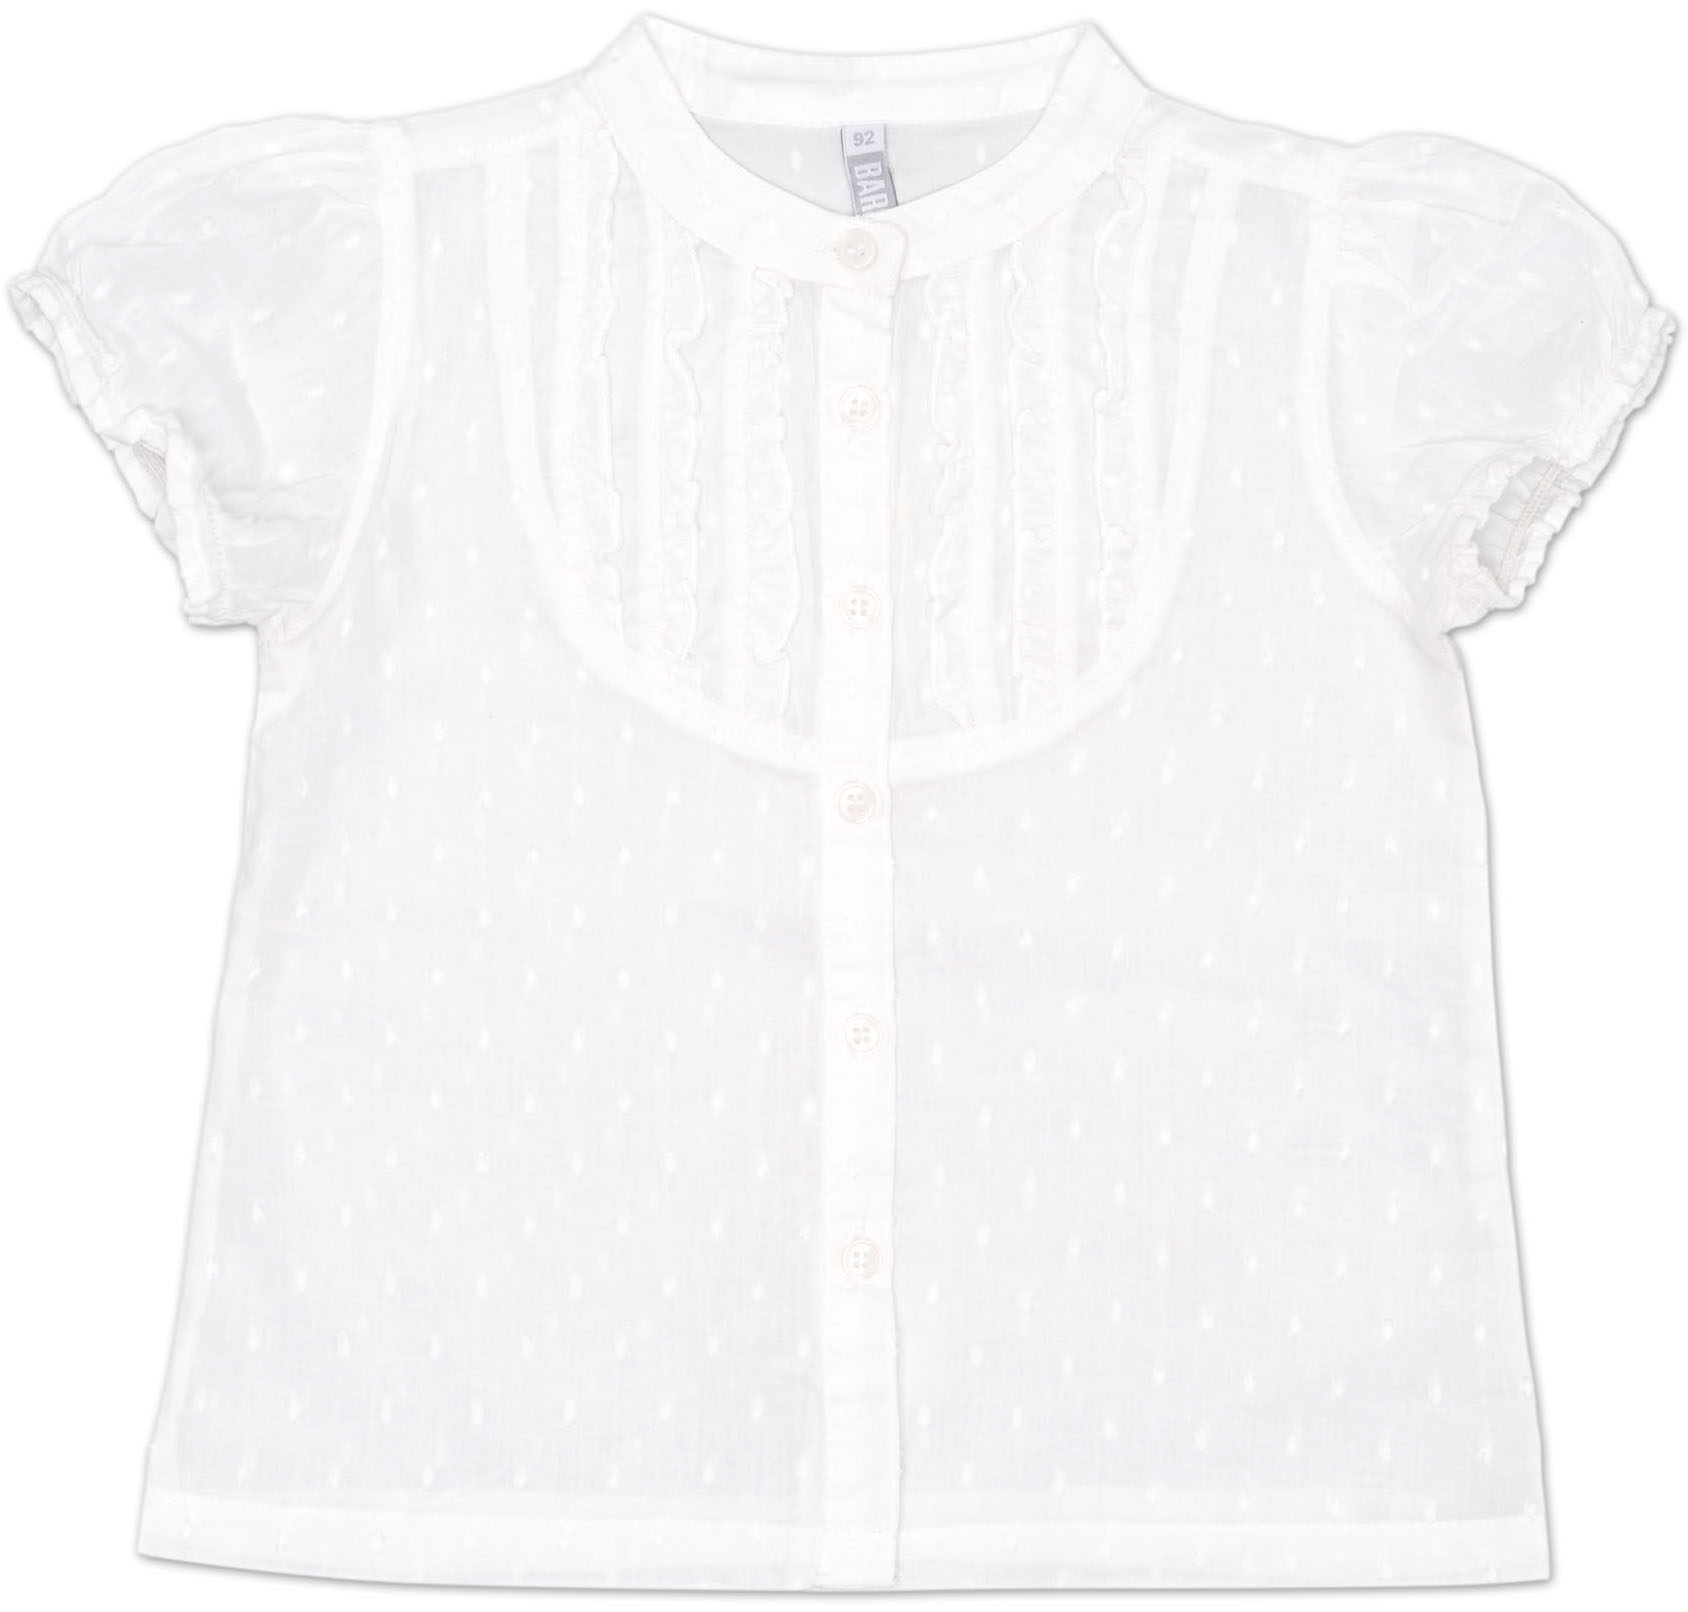 Блузка с коротким рукавом для девочки Barkito У синего-синего моря 917000 X001 75 у синего моря 2018 02 17t19 00